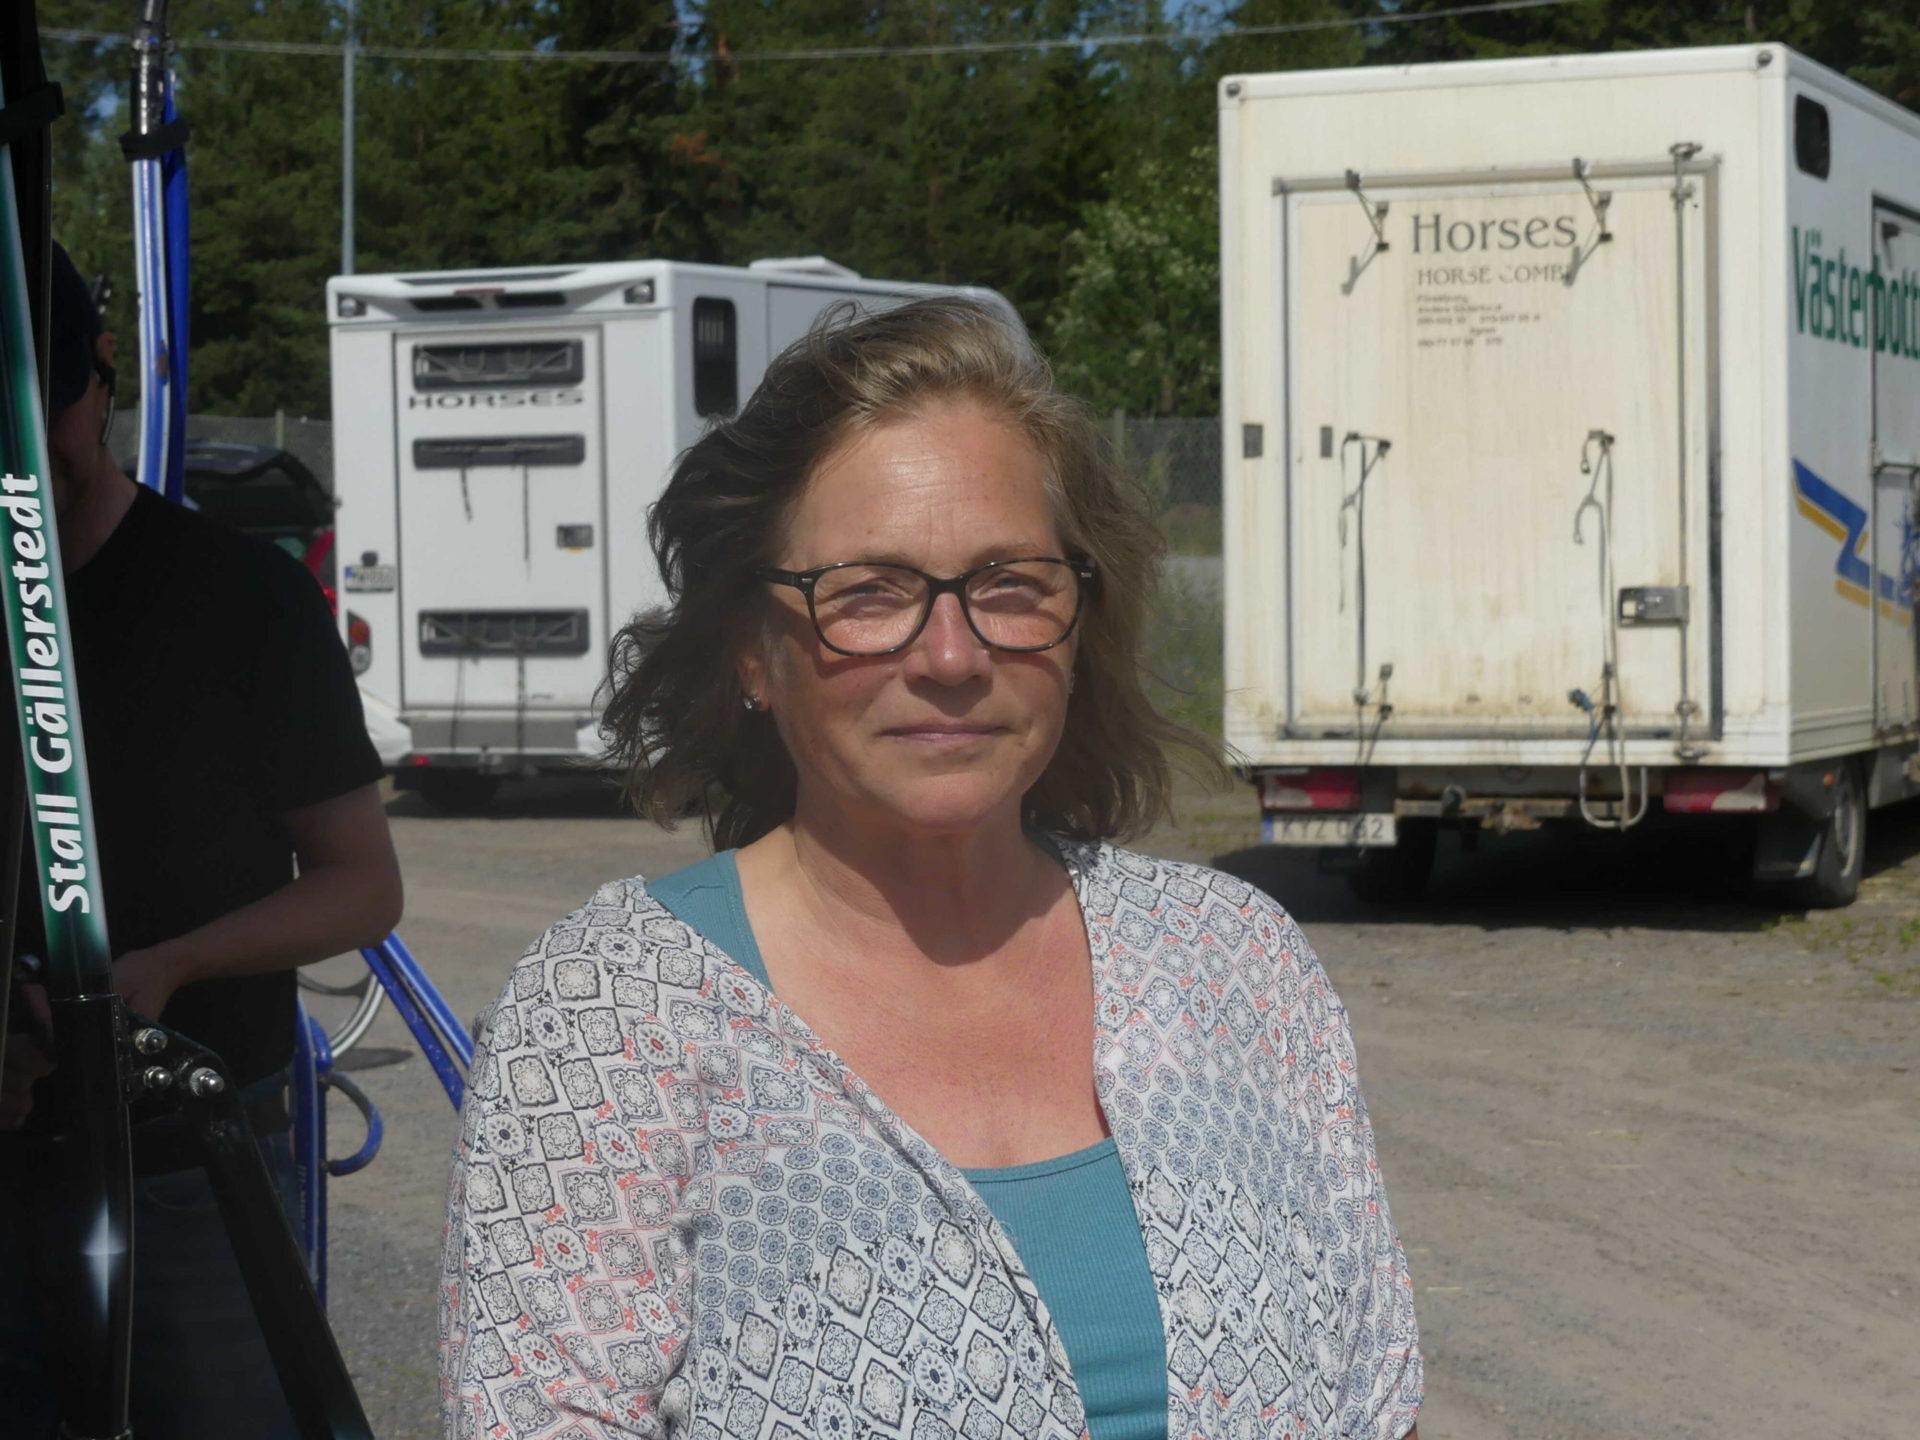 Tina Asplund